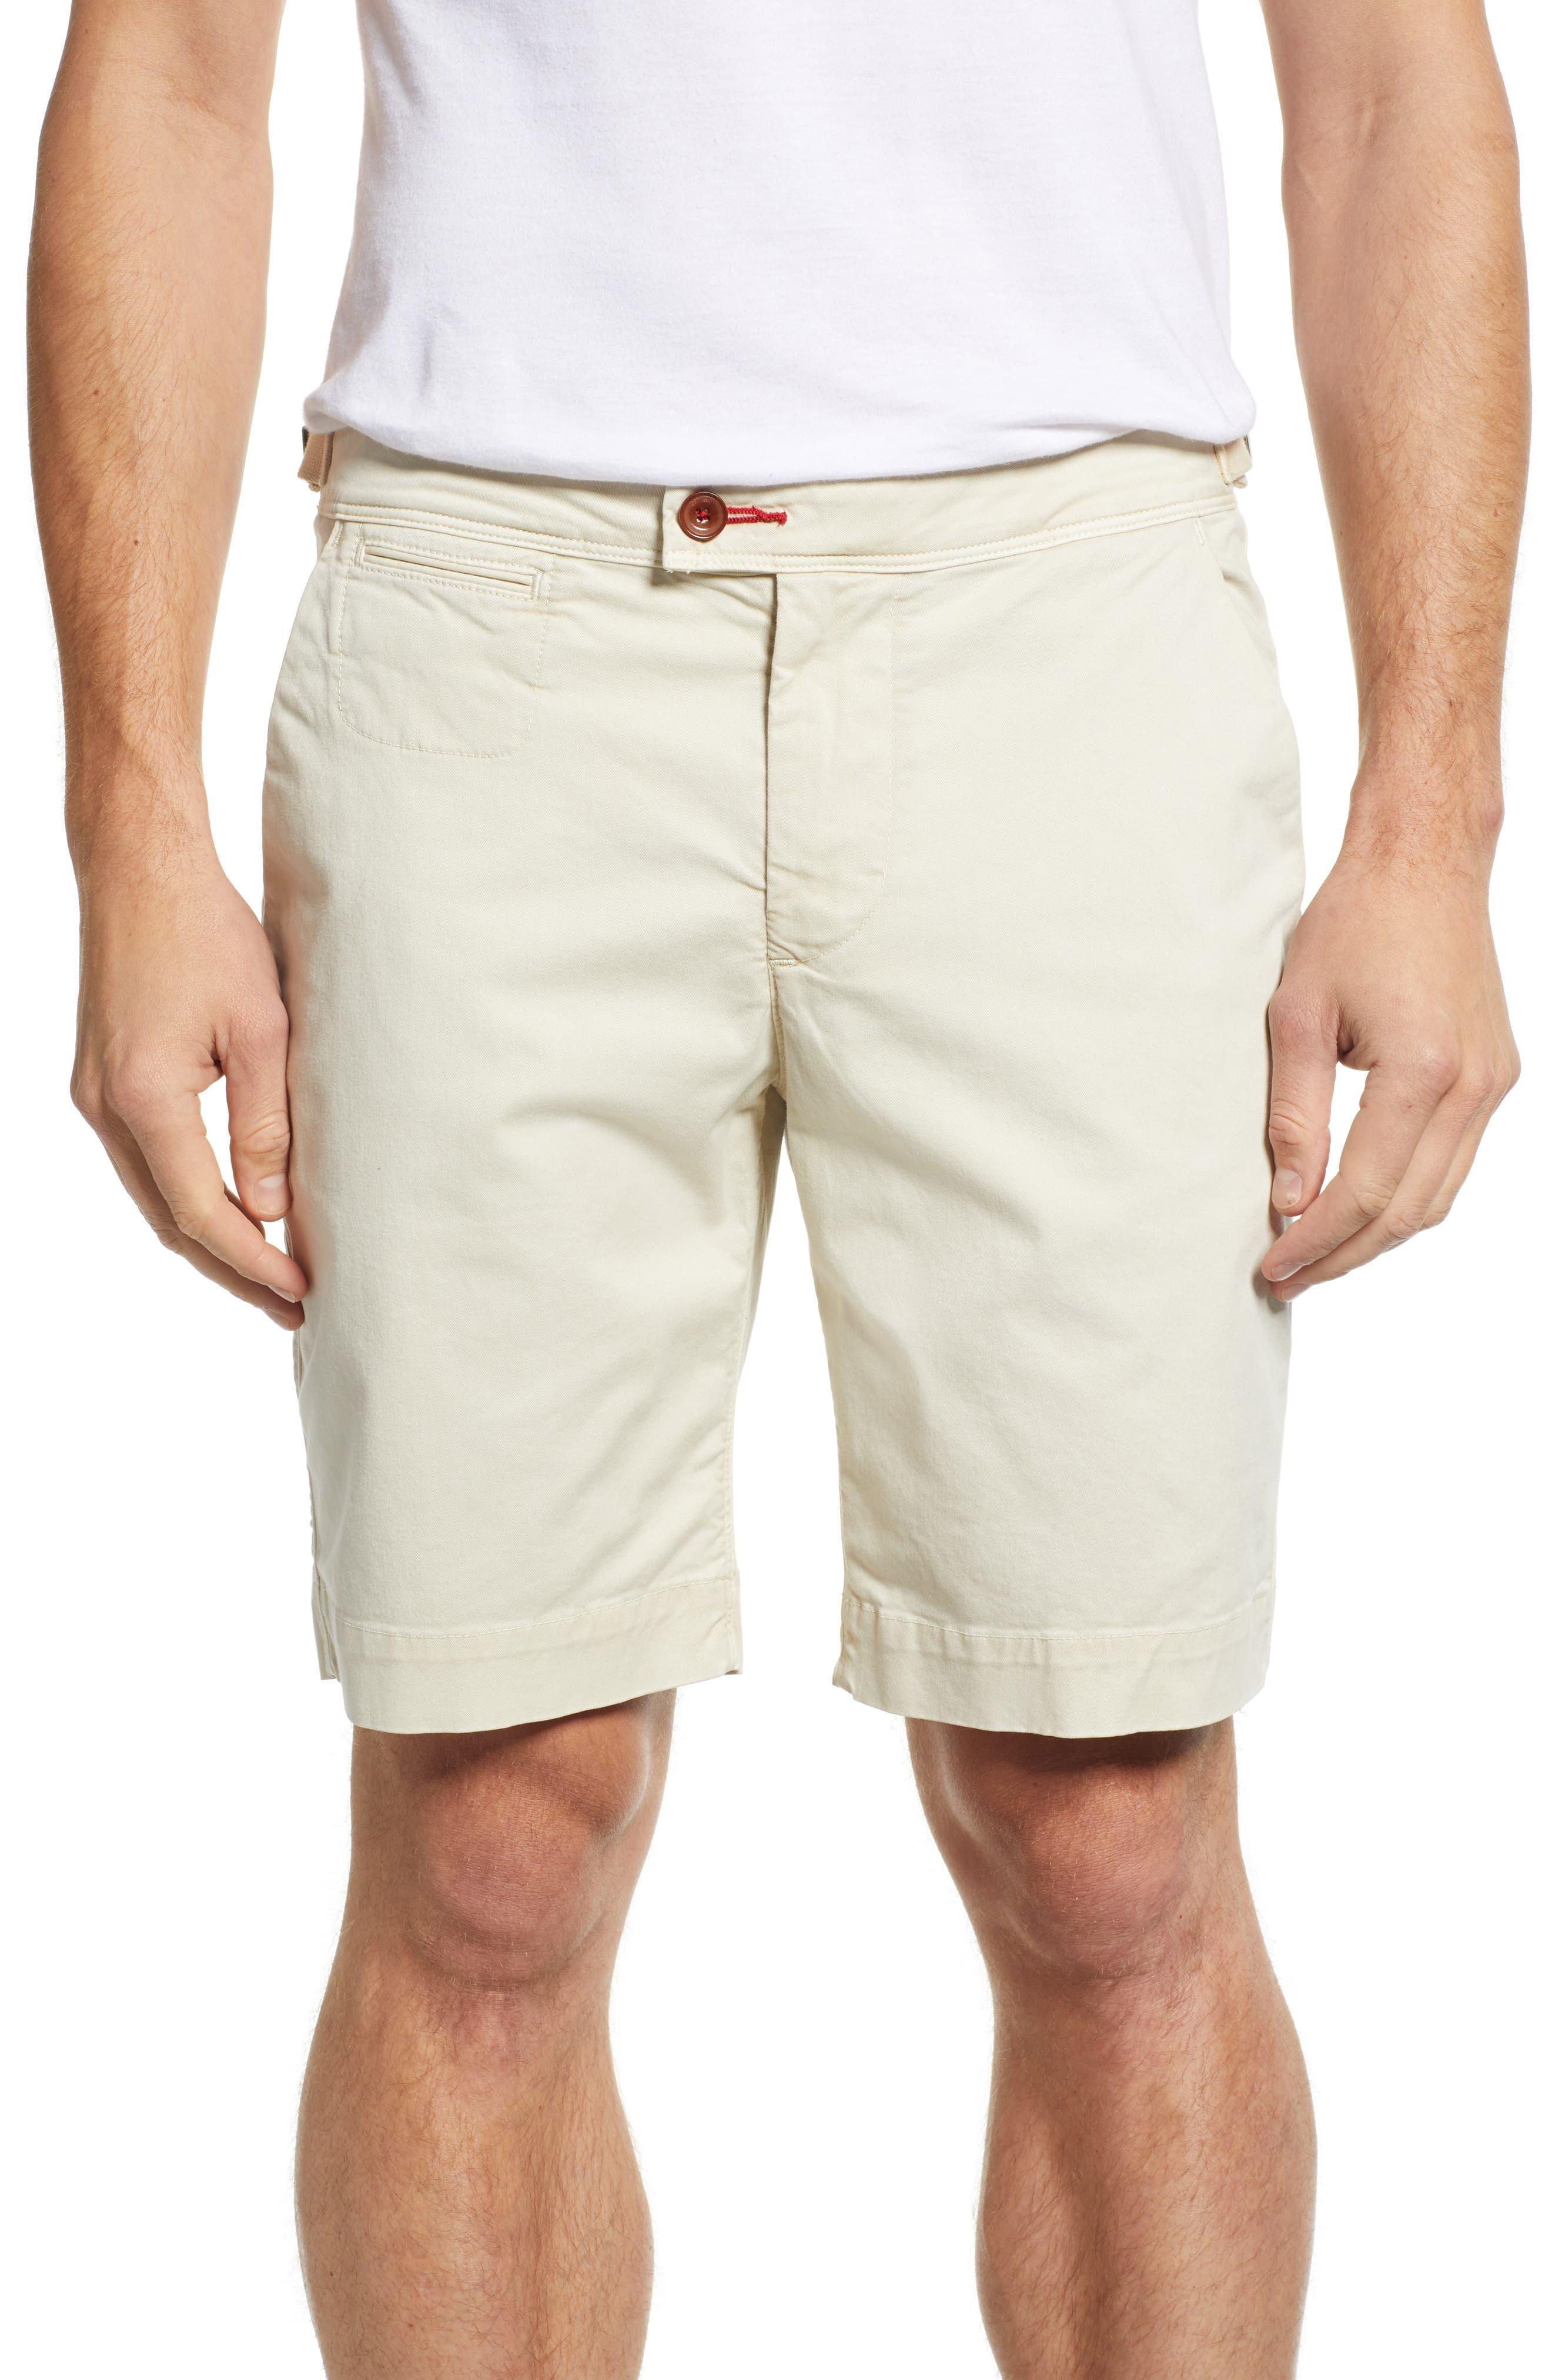 PSYCHO BUNNY Triumph Shorts, Main, color, 130